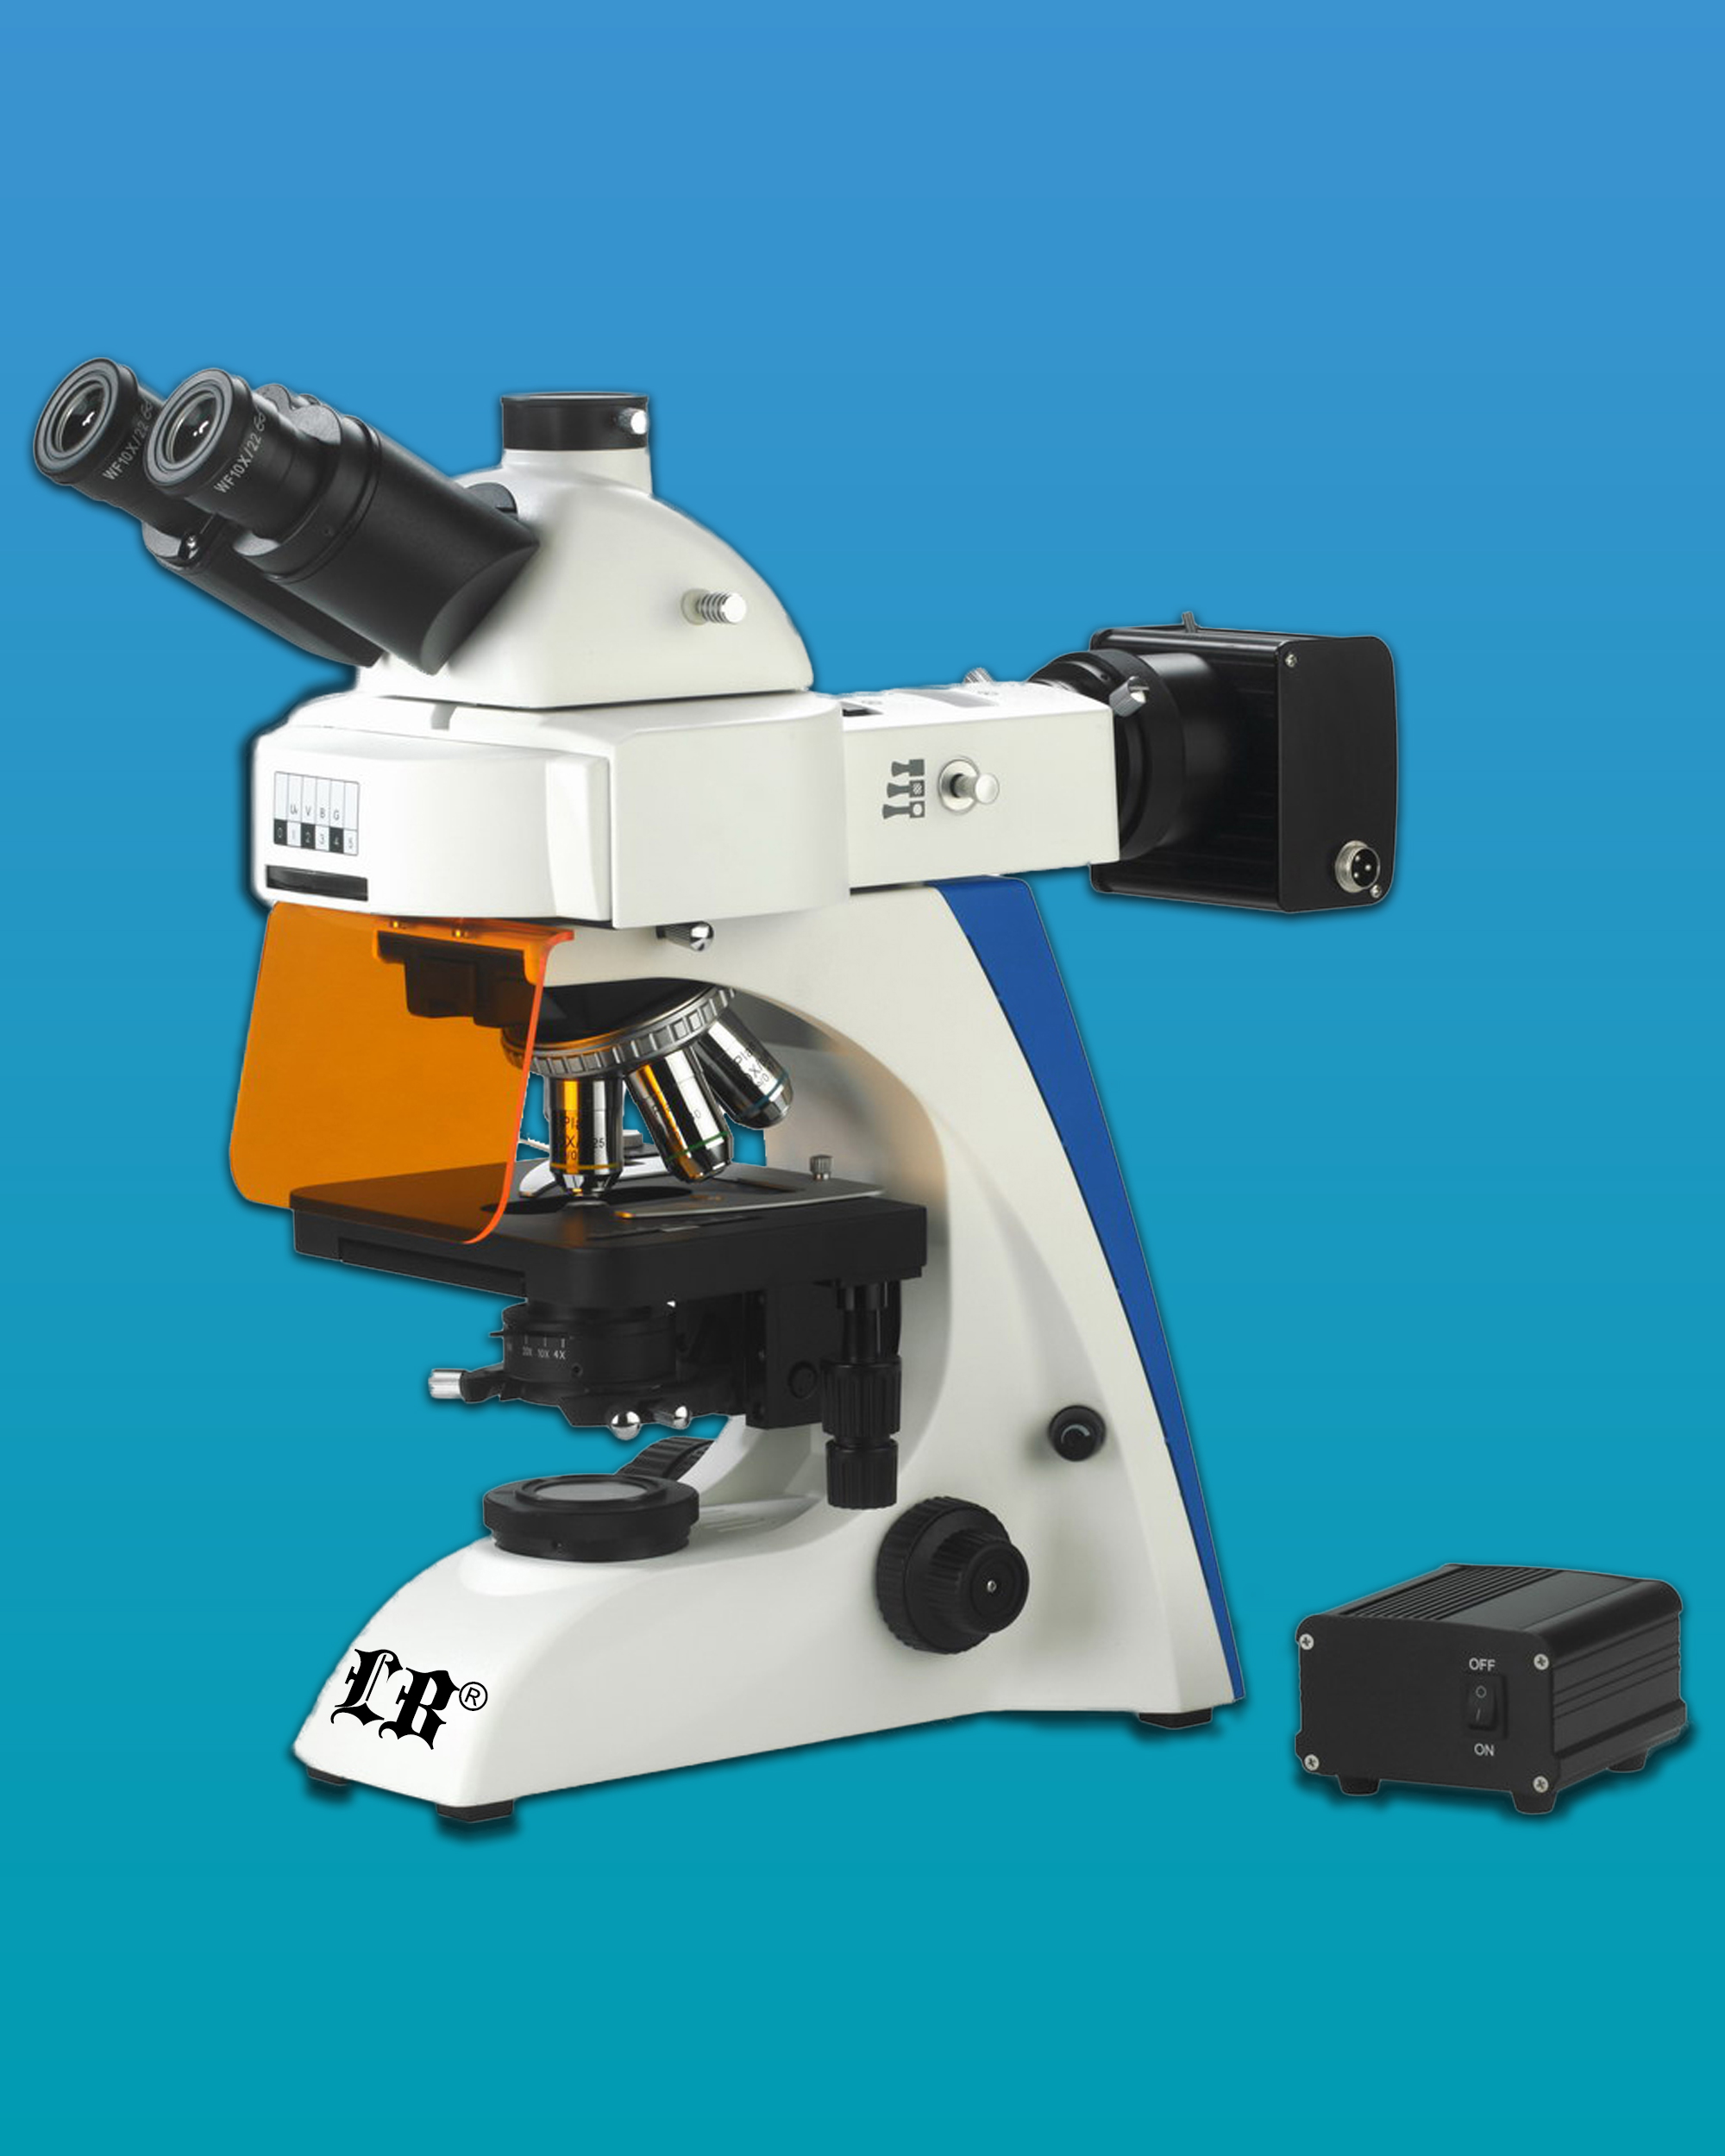 [LB-283] LED Flourescent Trinocular Medical Diagnostic Microscope